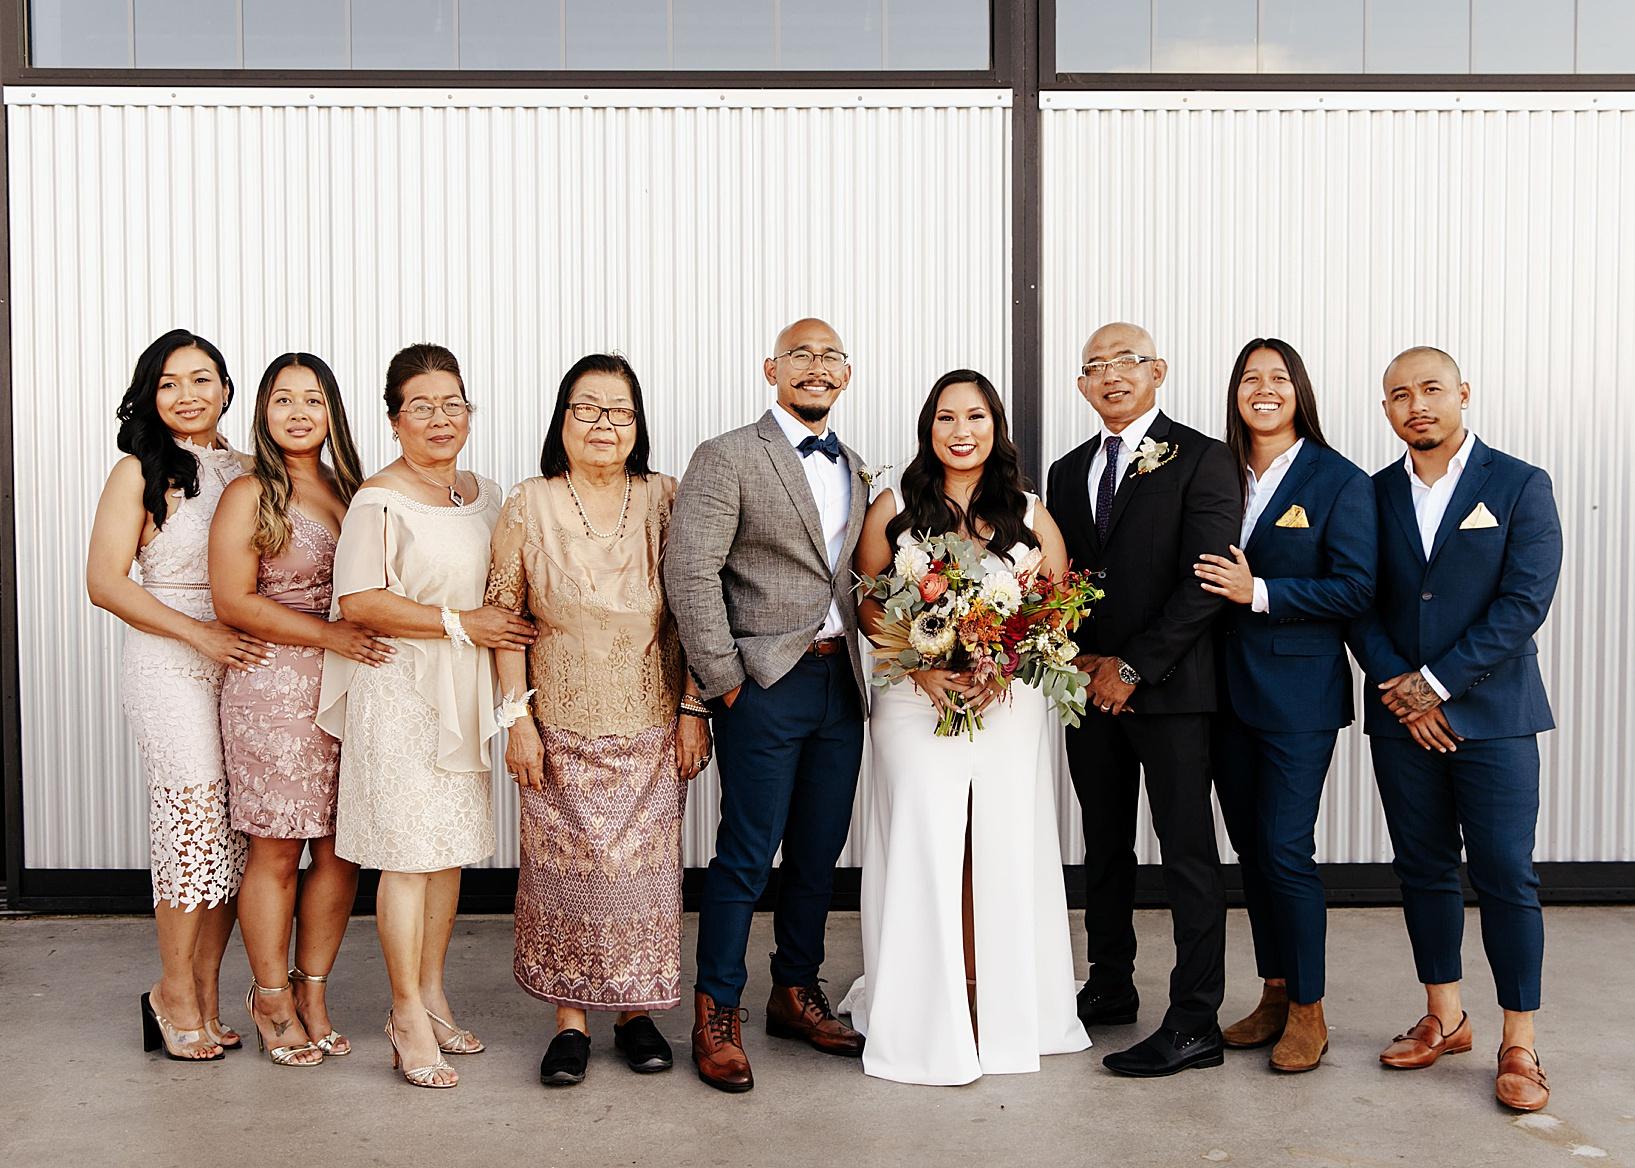 wedding party for Fullerton Wedding at Hangar 21 South